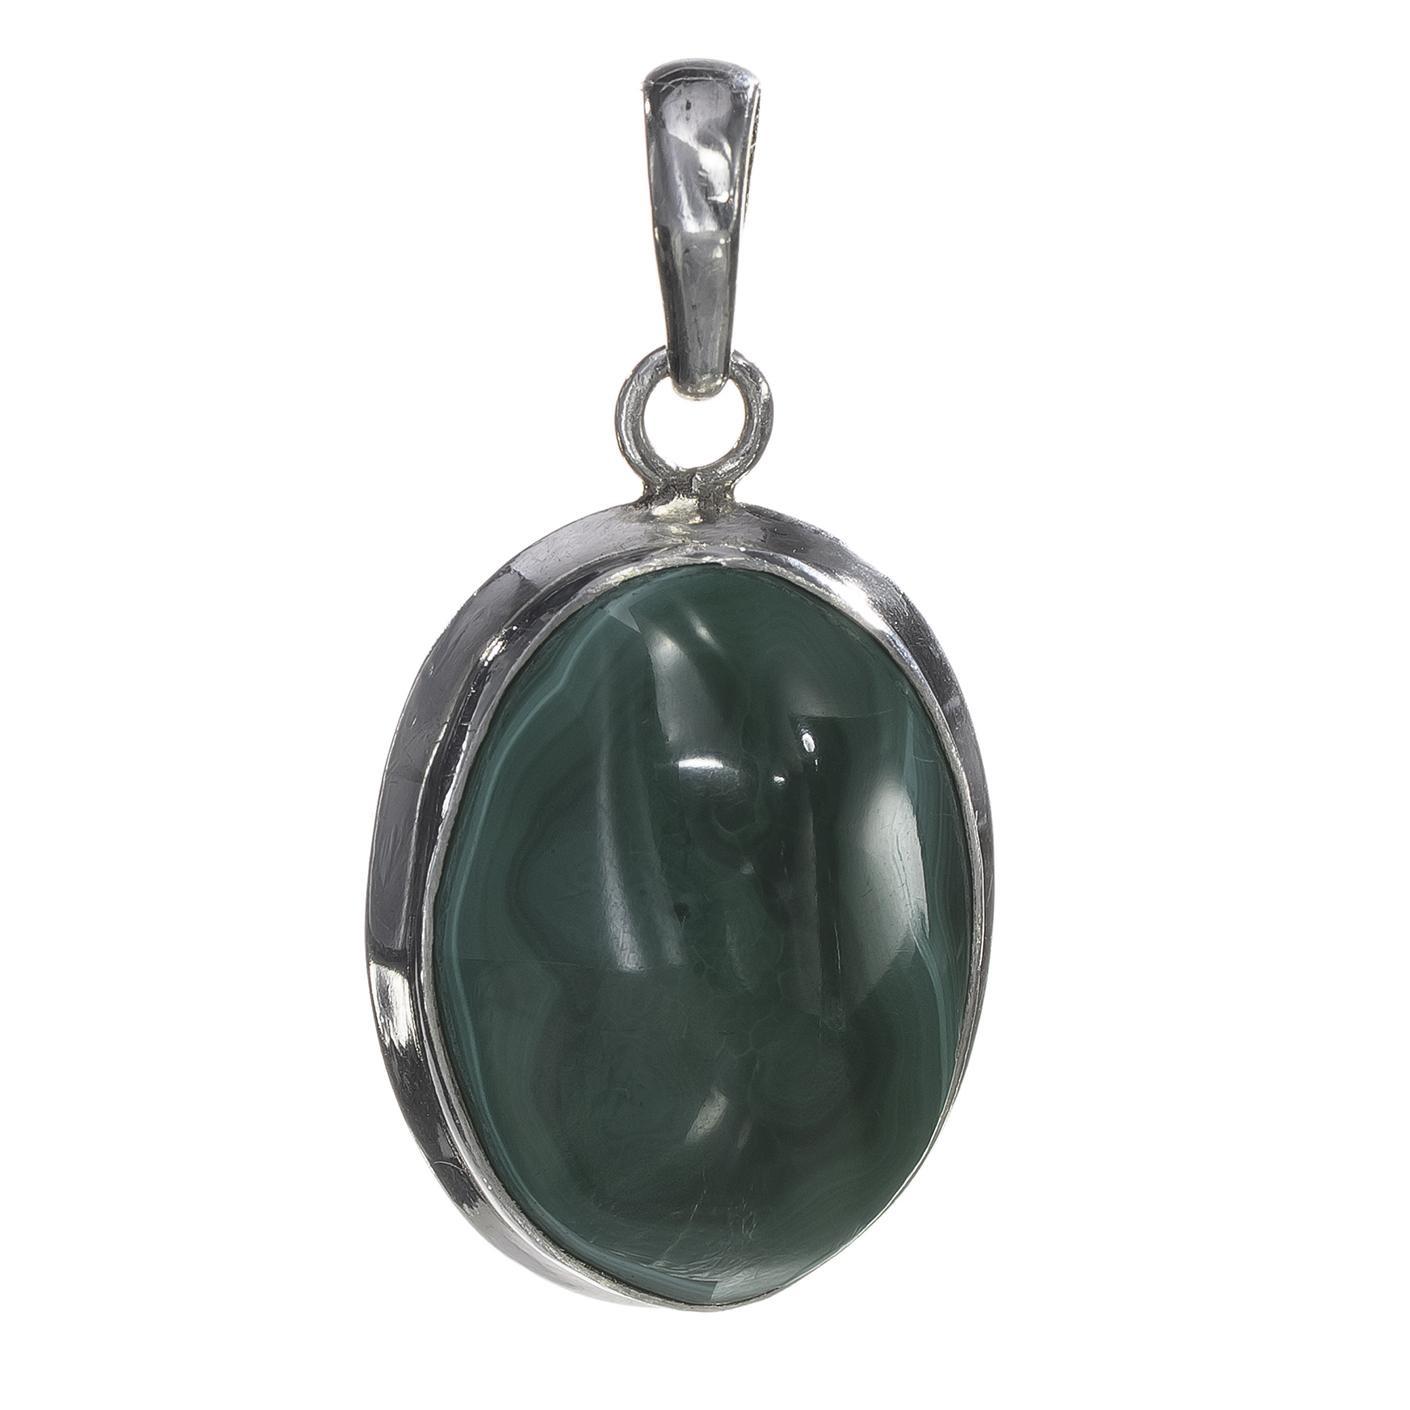 Solitaire Bezel Green Oval Malachite Pendant